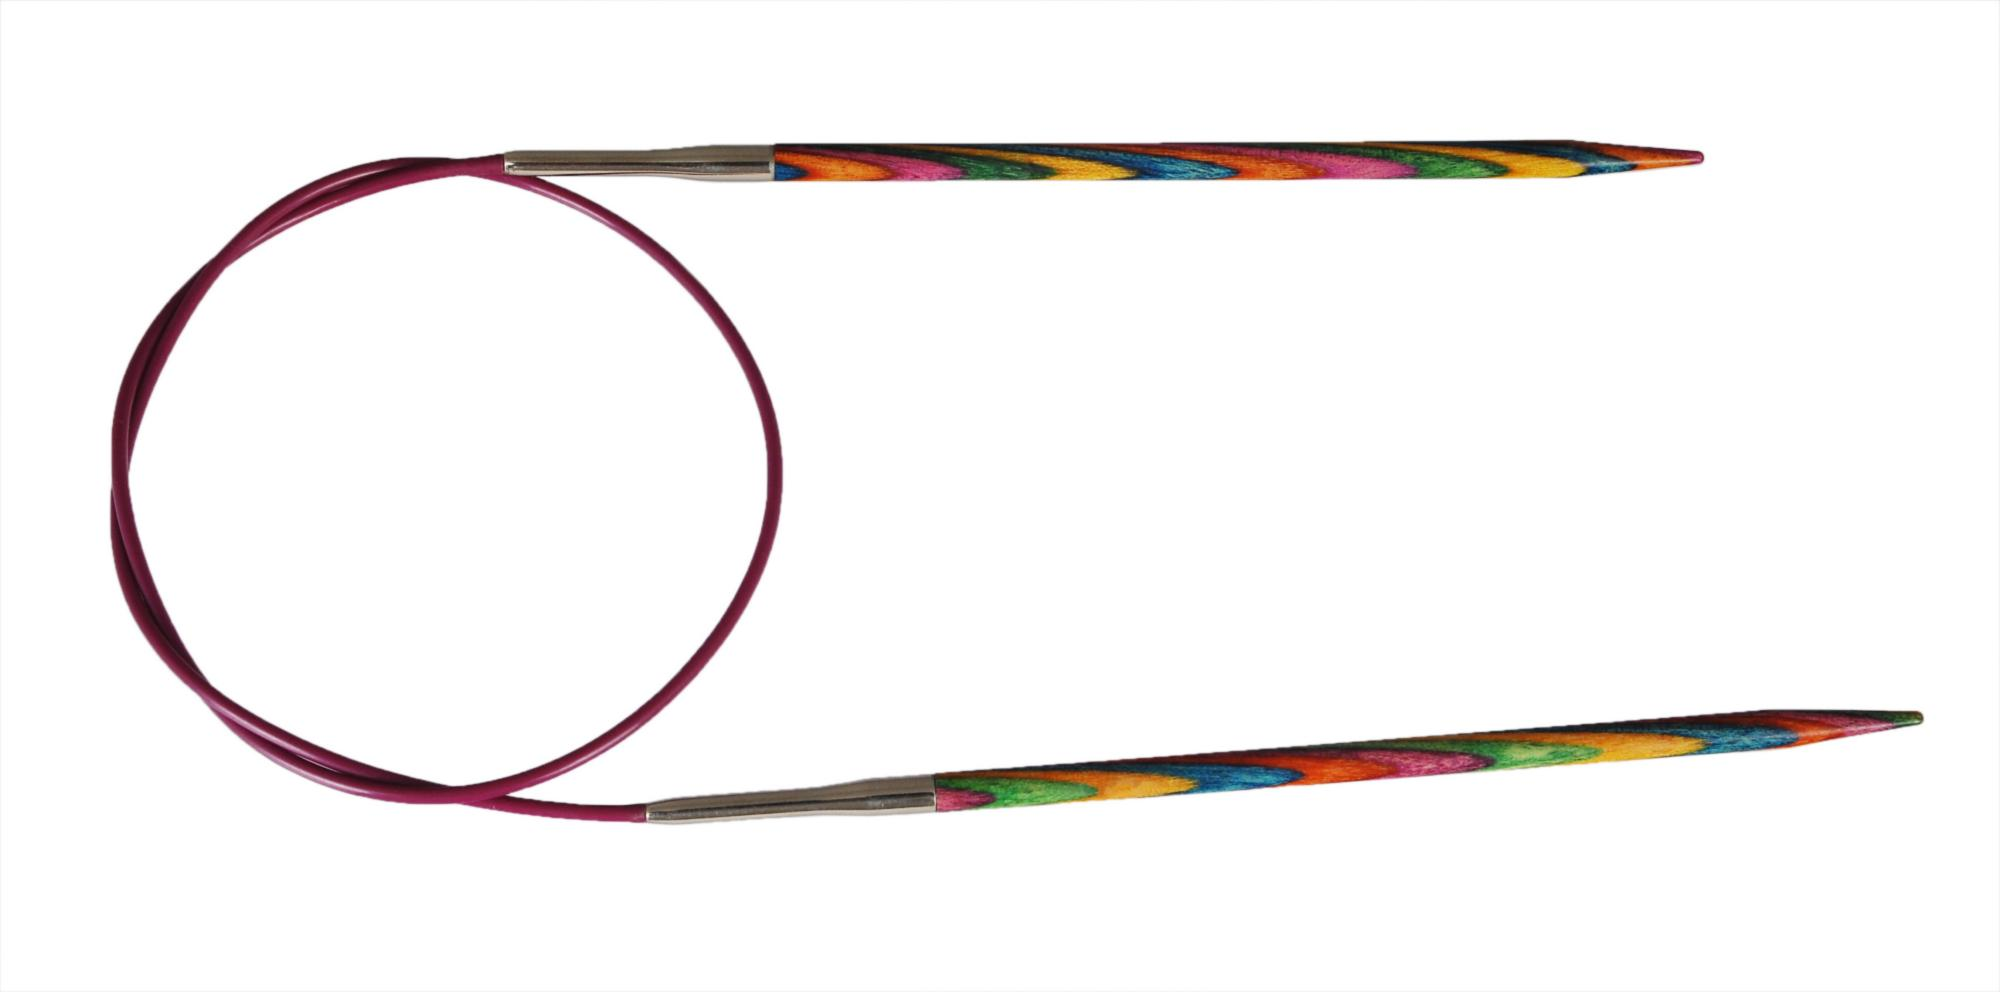 Спицы круговые 120 см Symfonie Wood KnitPro, 21377, 12.00 мм